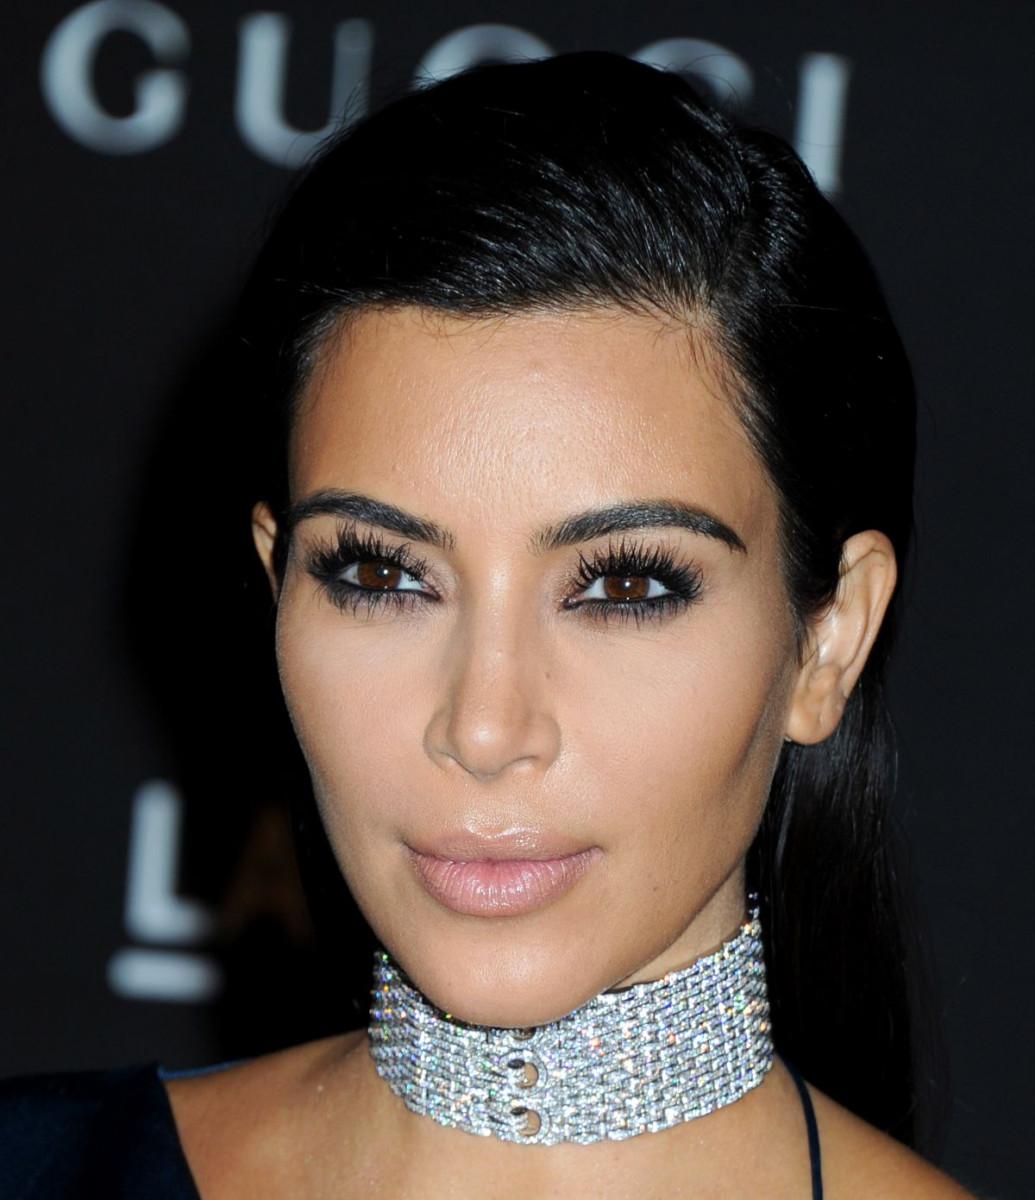 kim_kardashian_at_2014_lacma_art_film_gala_in_los_angeles_9-gthumb-gwdata1200-ghdata1200-gfitdatamax.jpg